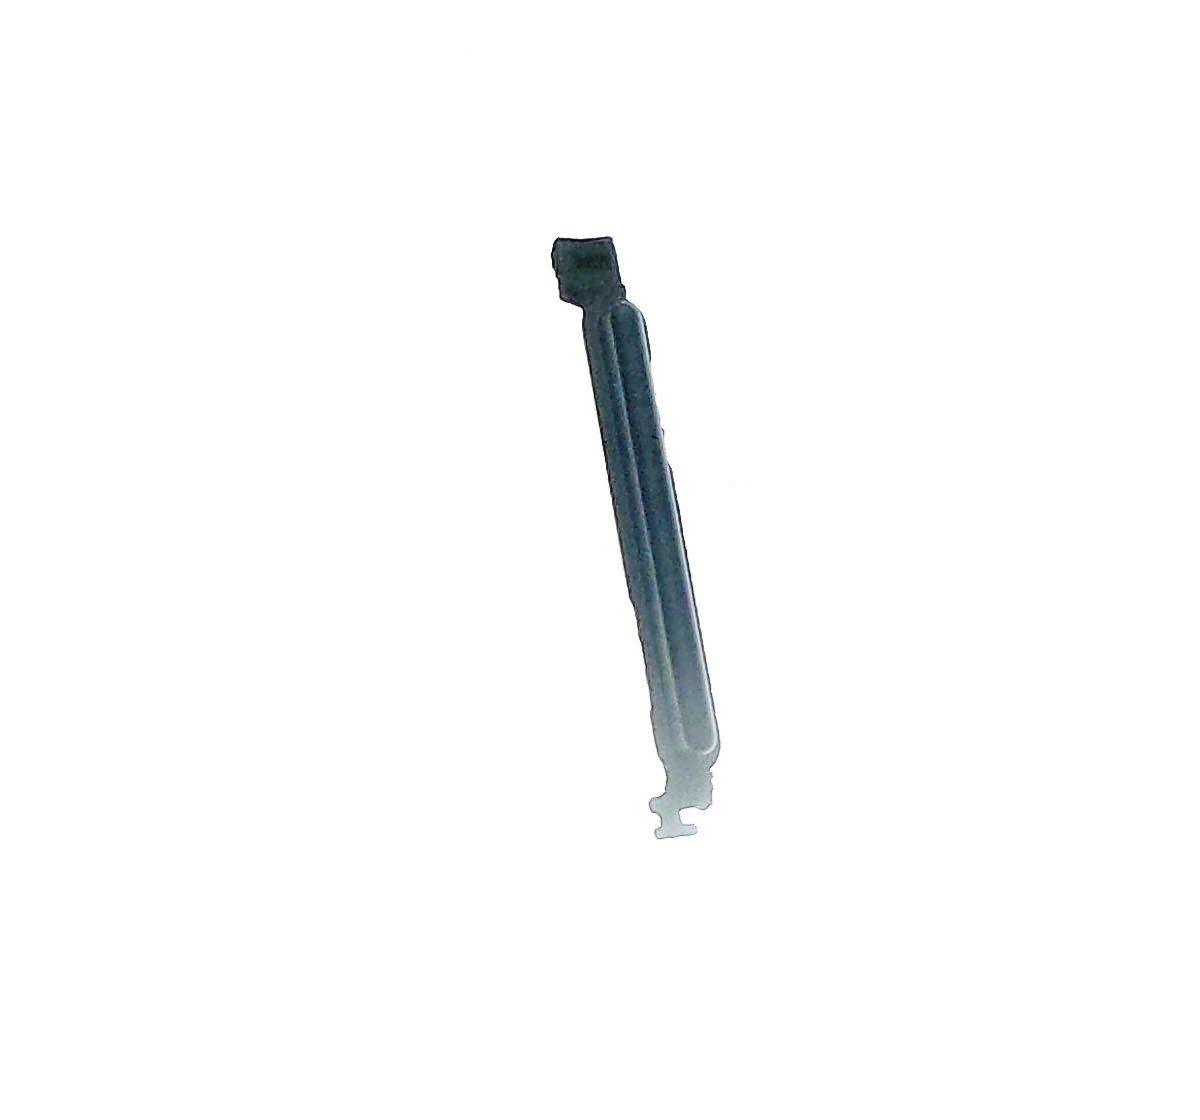 Bouton volume pour Asus Memo pad smart 10.1 ME301T ME301